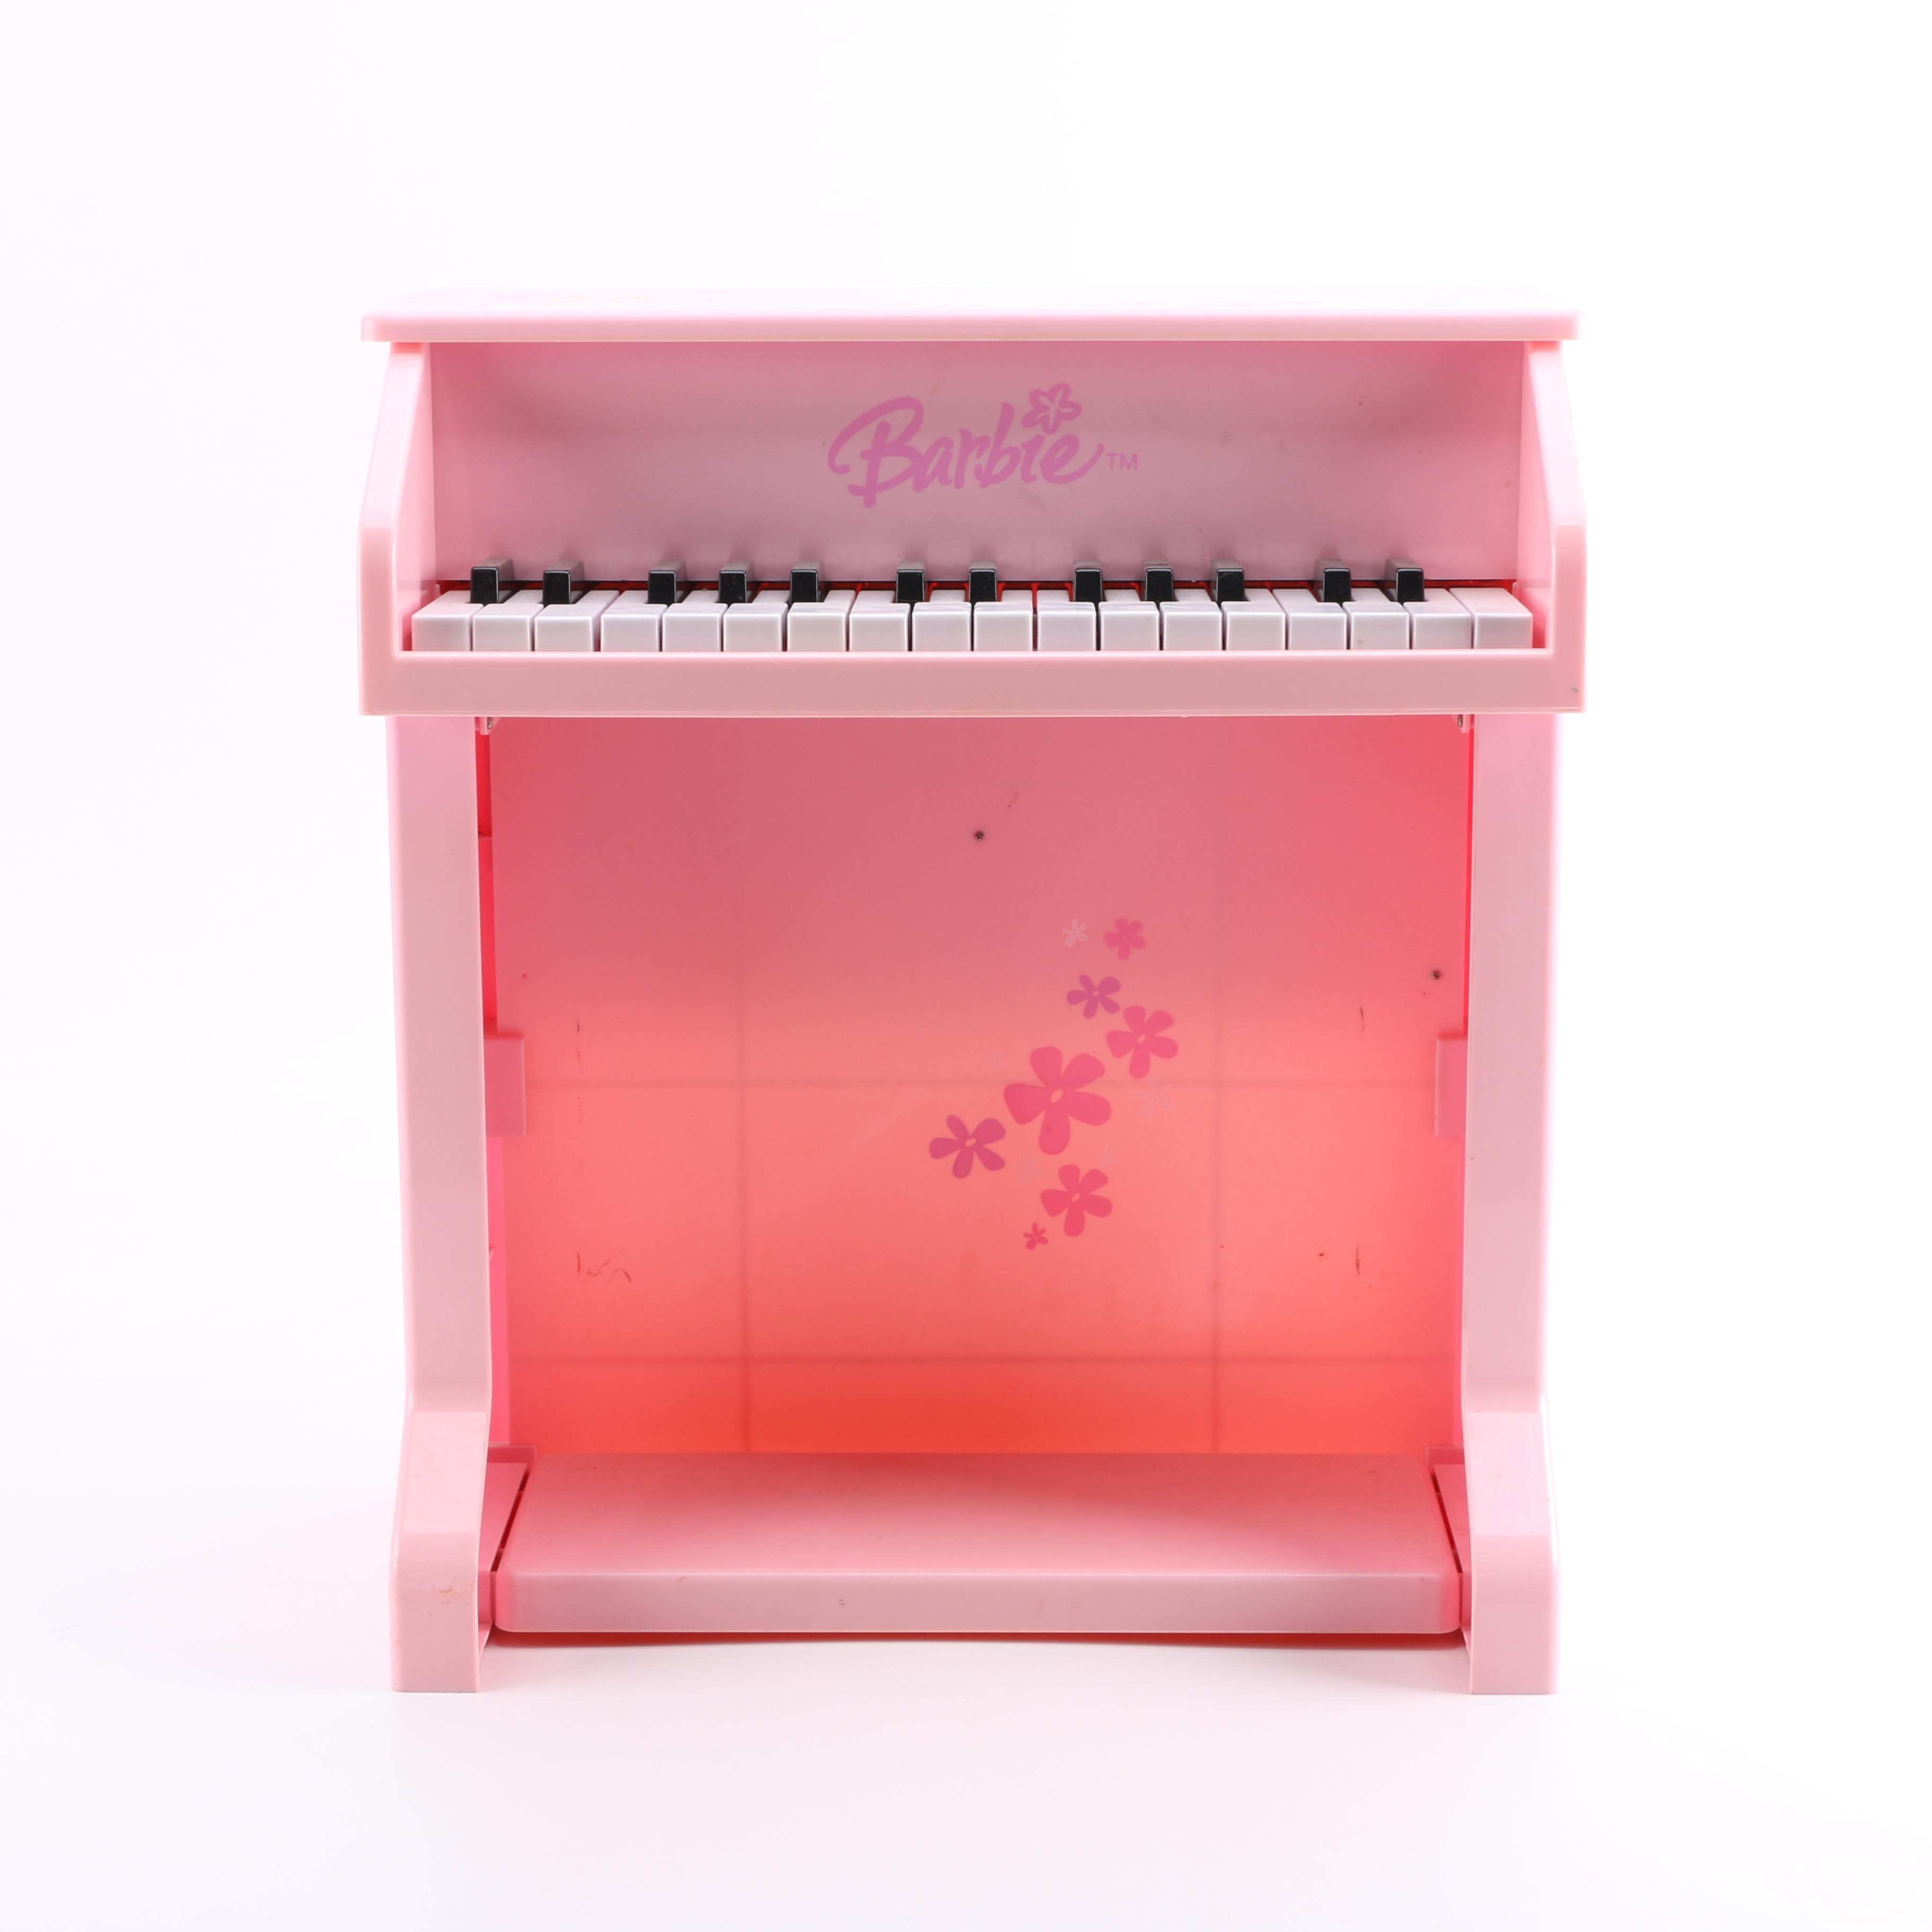 Mattel Barbie Toy Piano